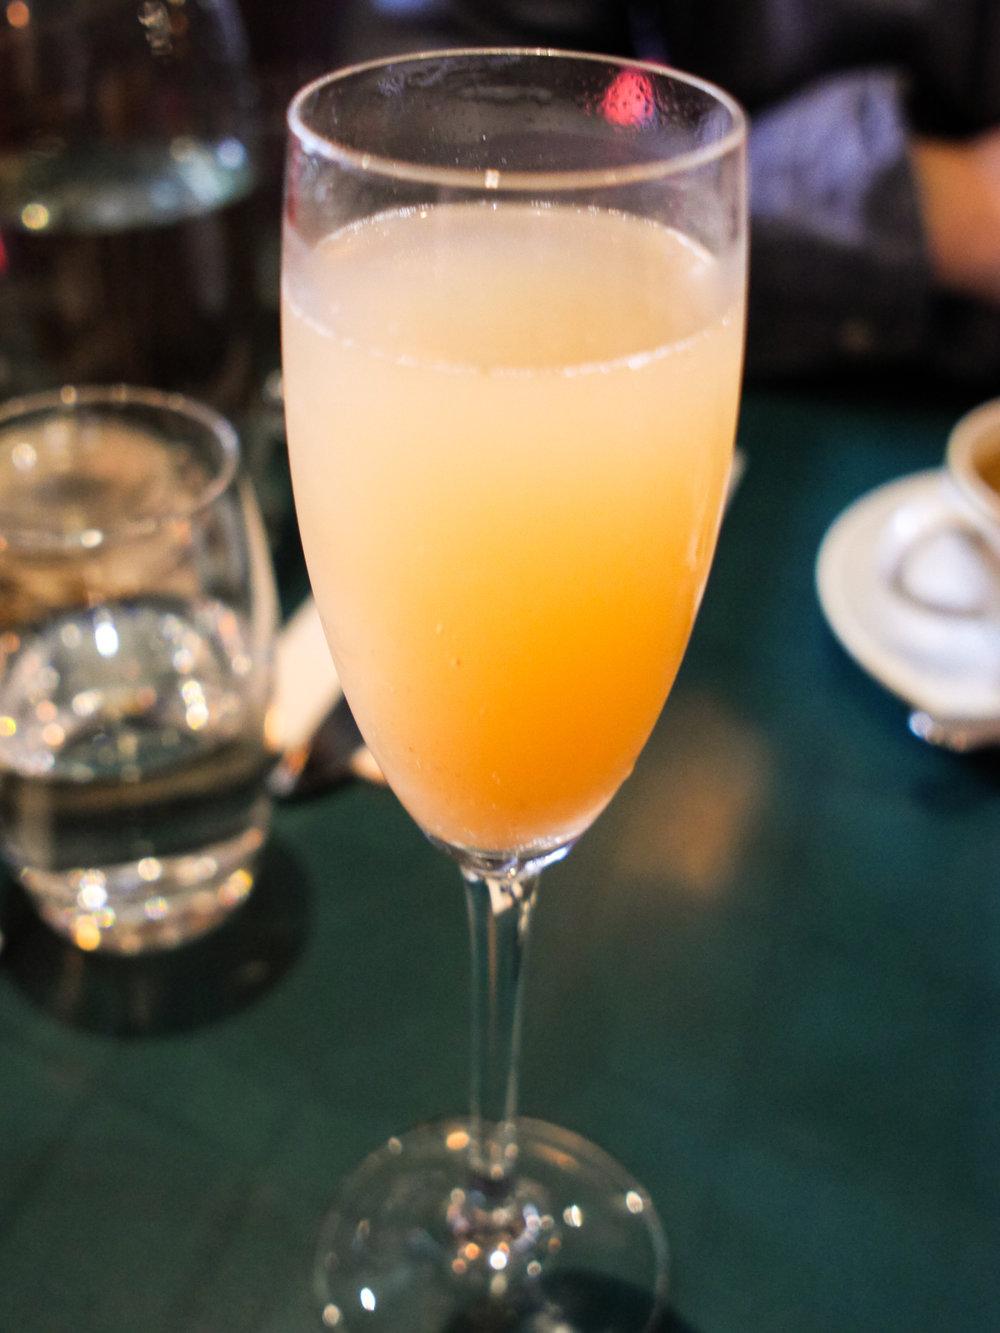 Peach bellini at San Lorenzo's in Dublin, Ireland